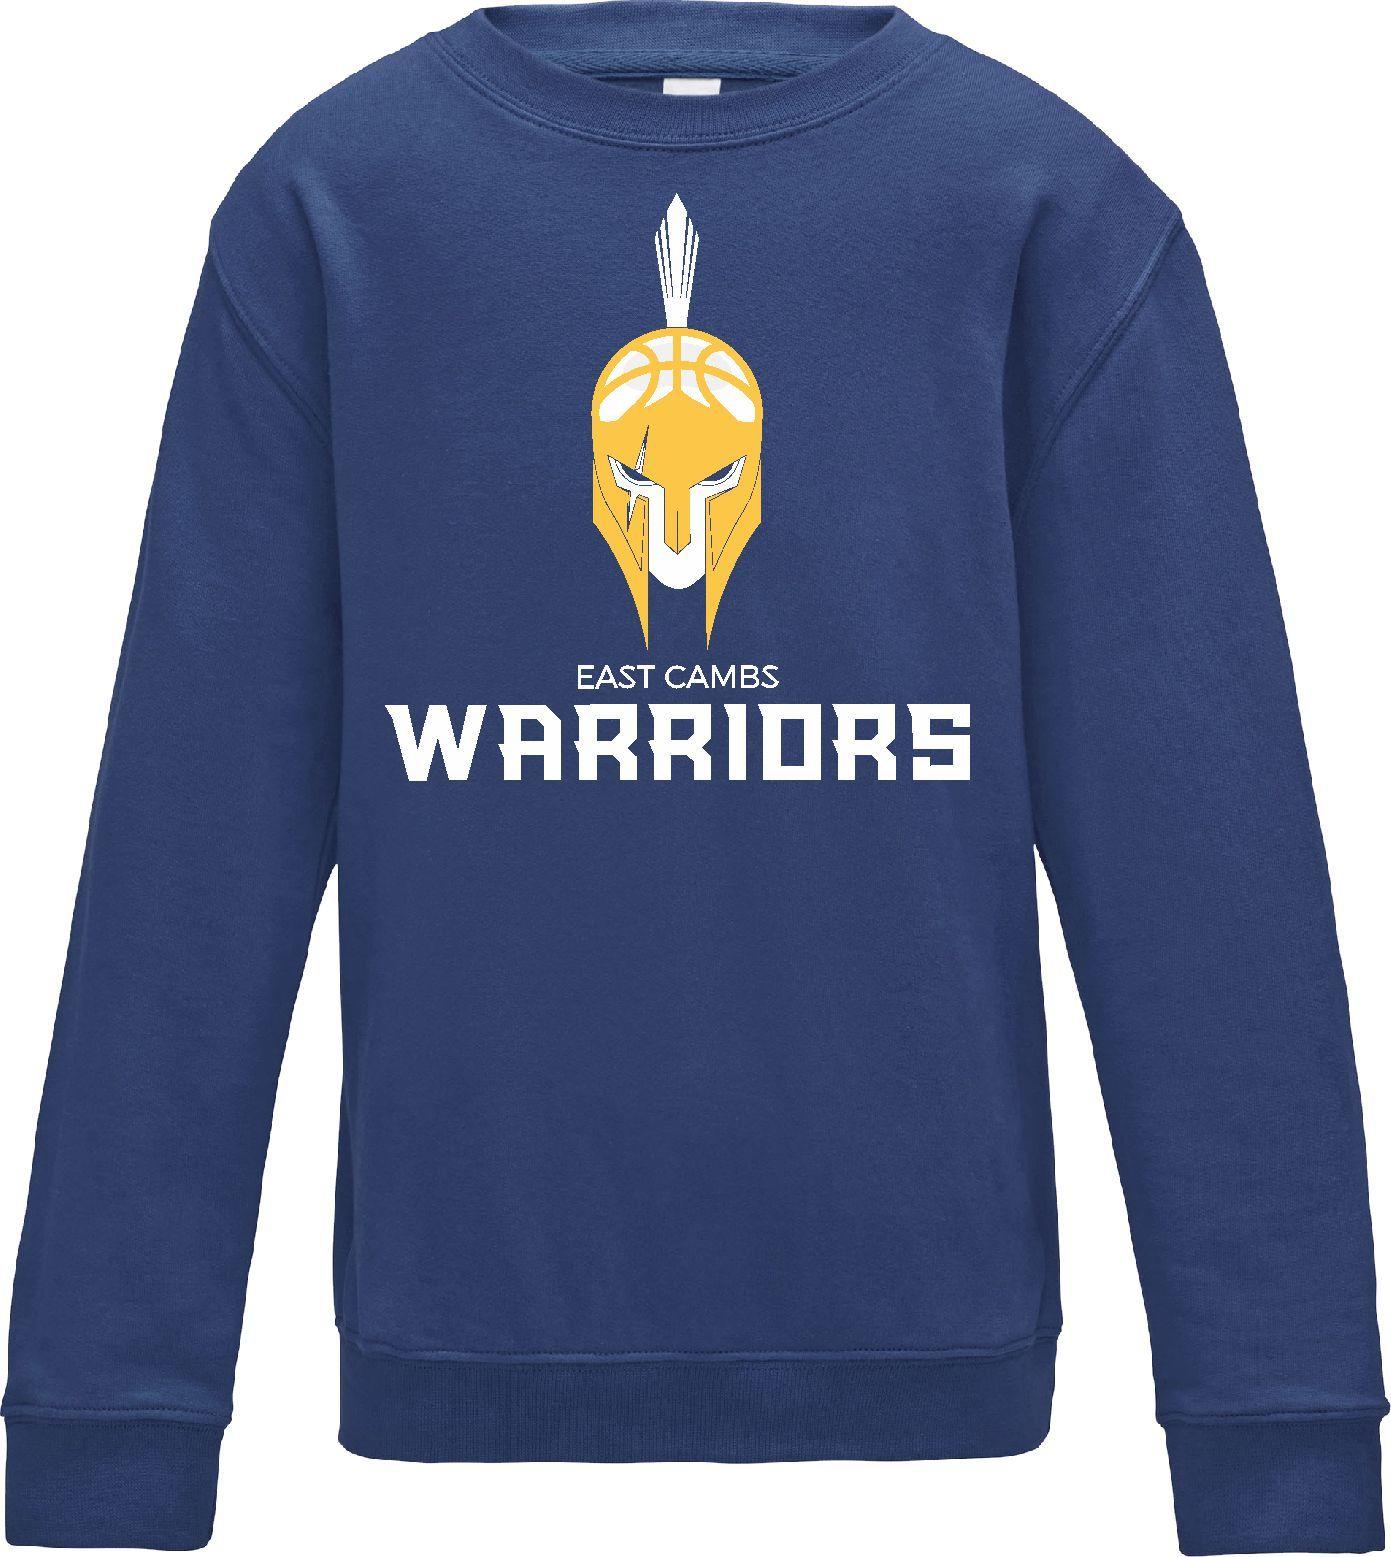 Warriors - Kids Sweatshirt (Royal Blue)